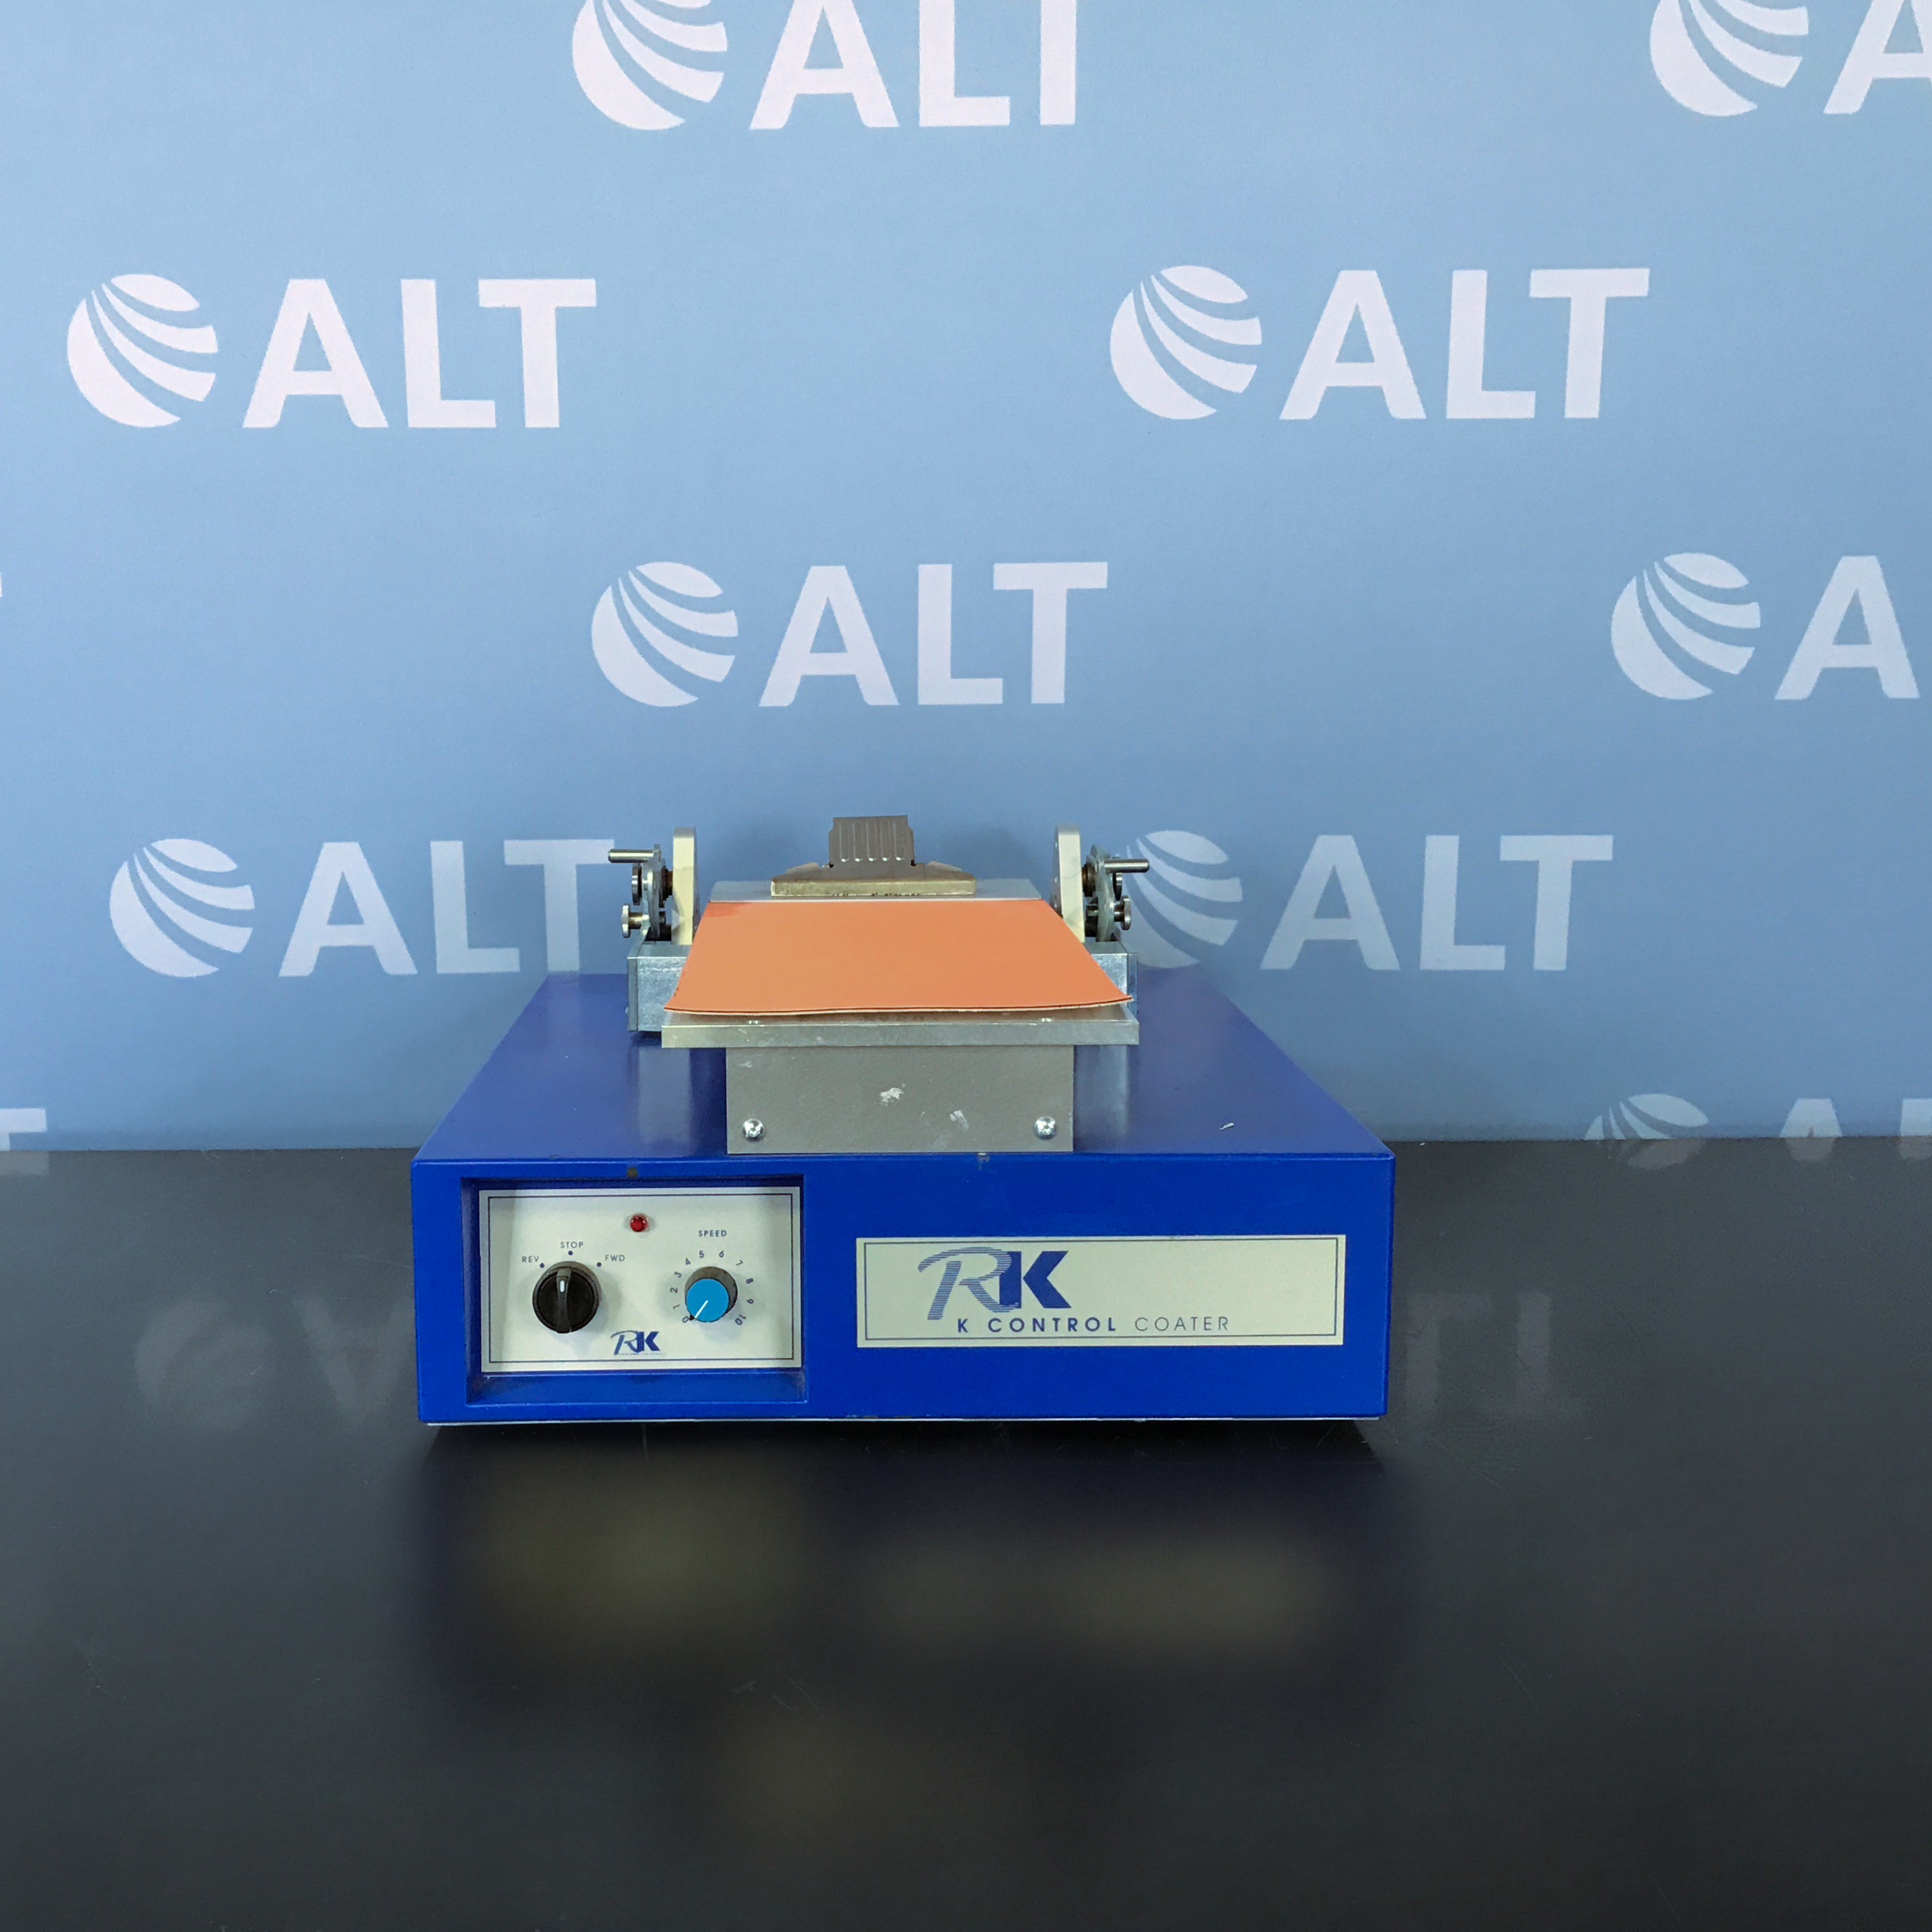 RK PrintCoat Instruments  K Control Coater Model K101 Image